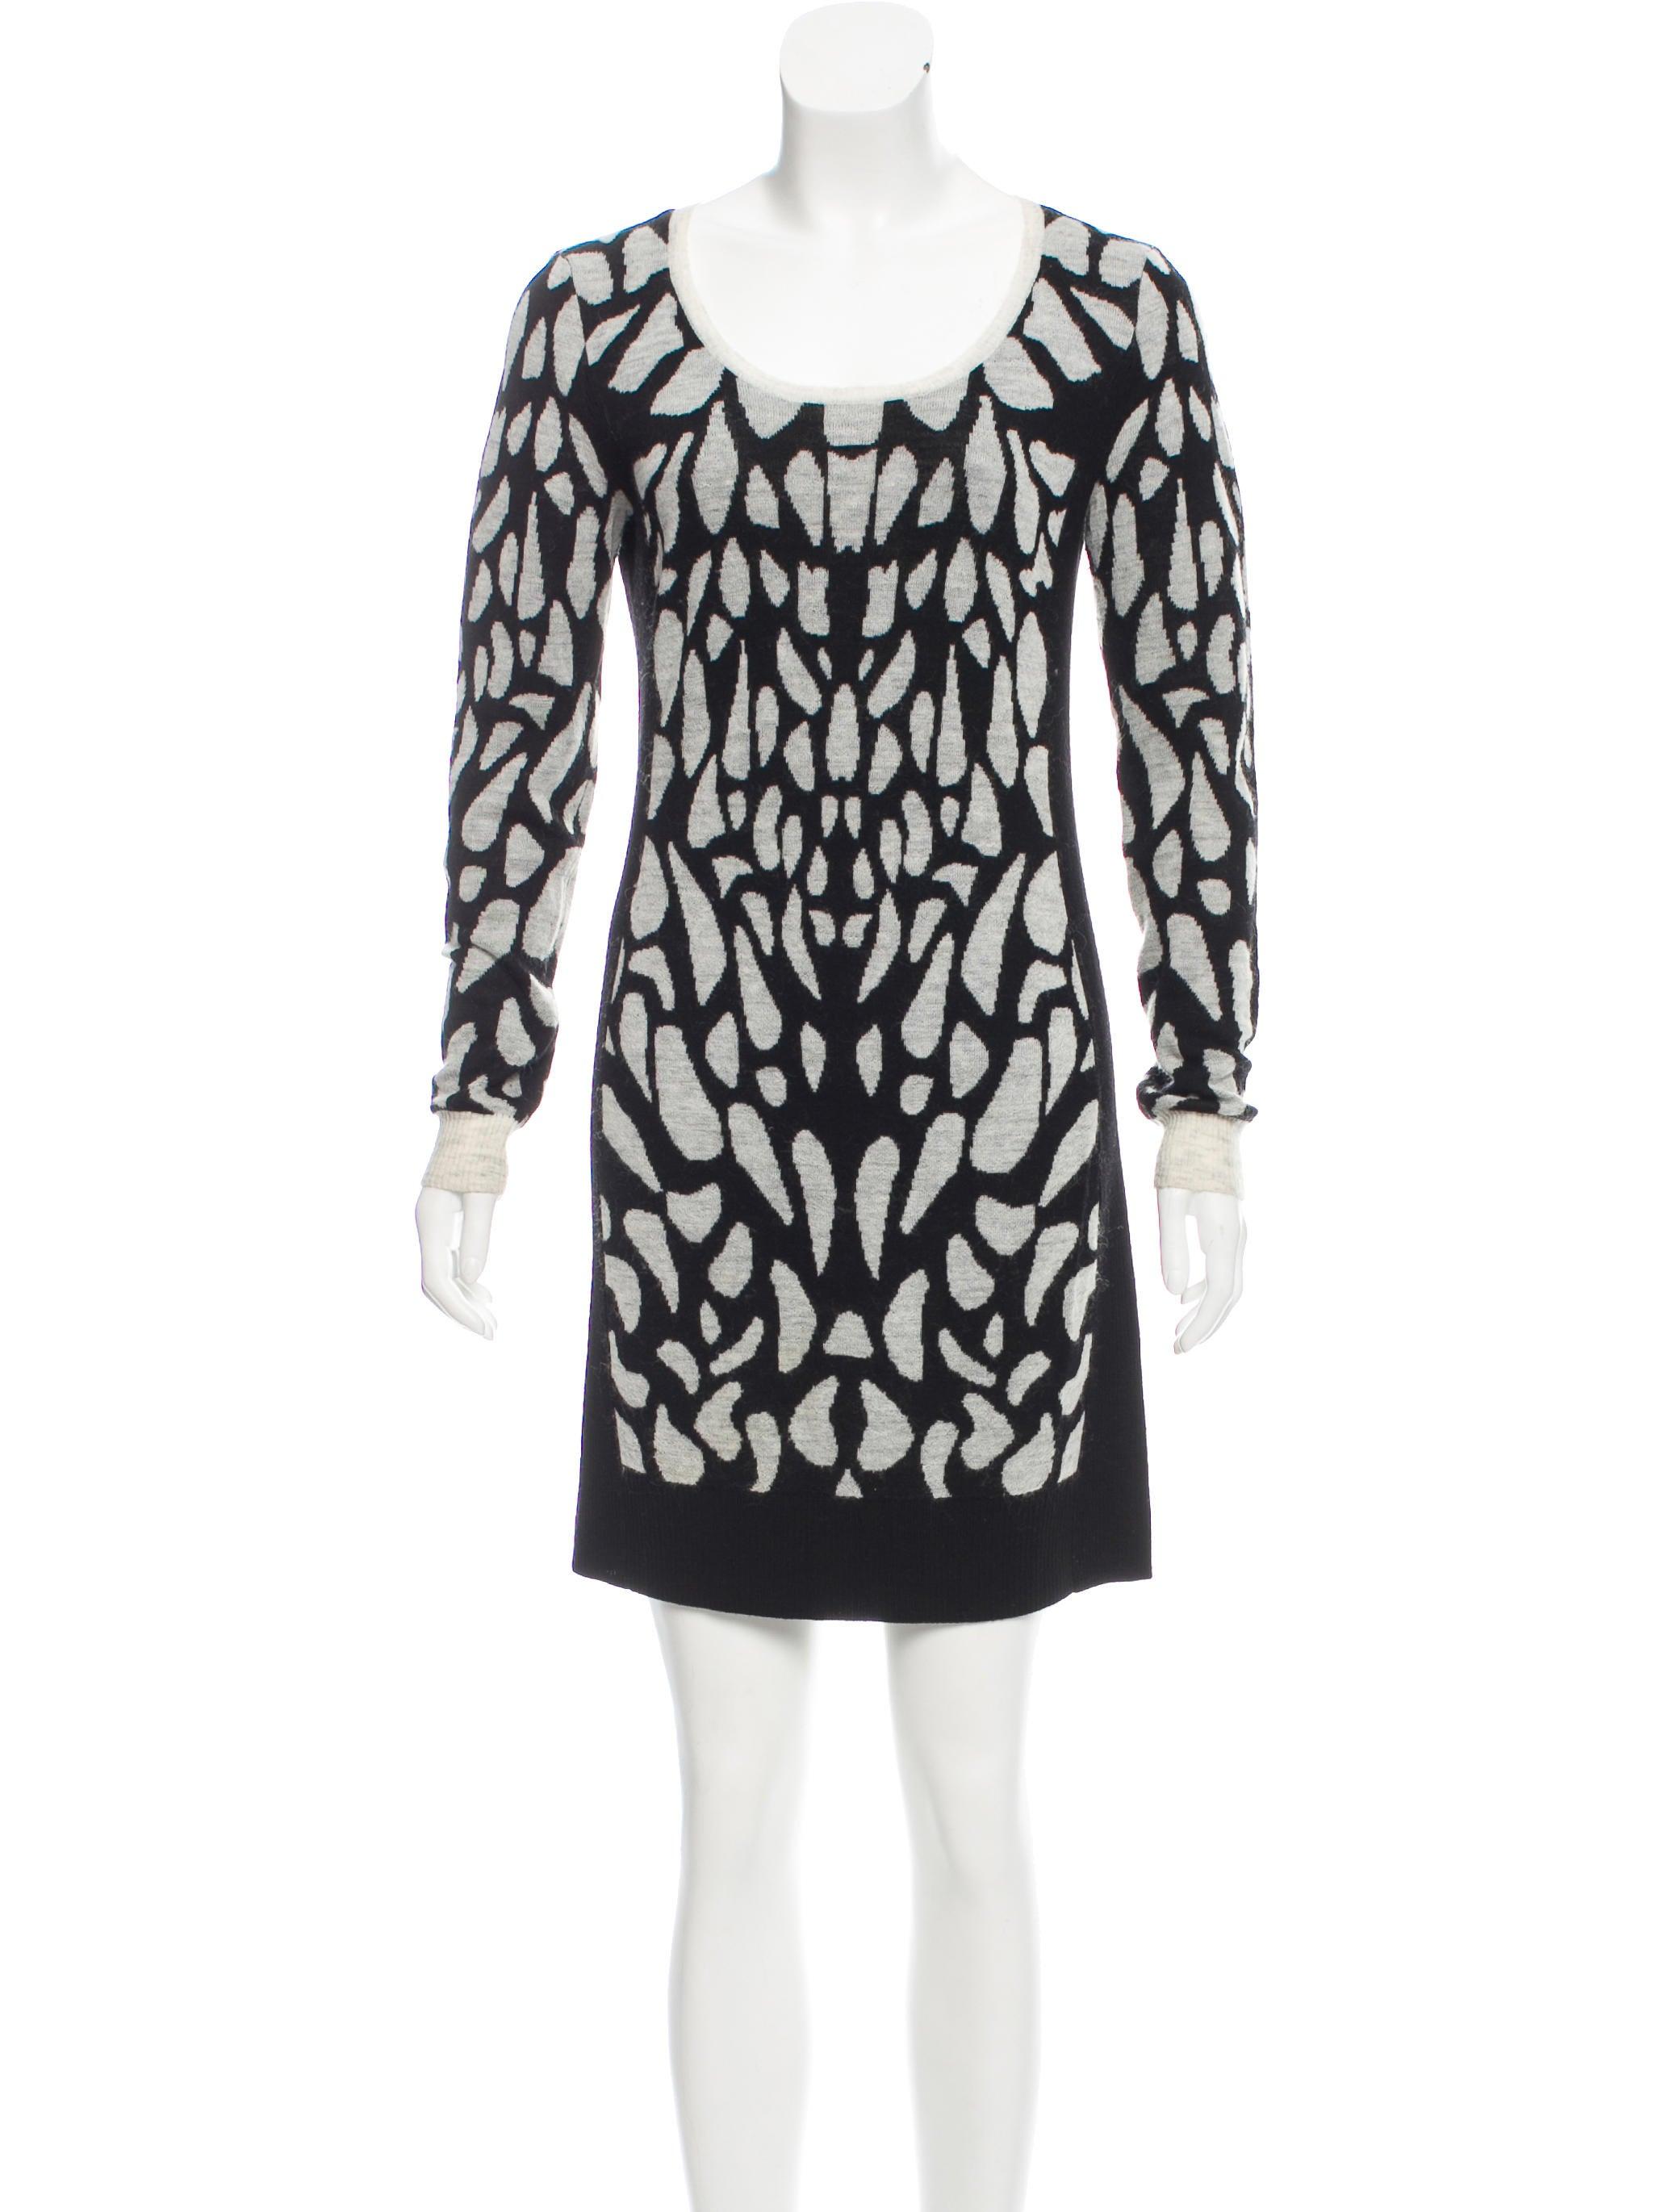 34ec112ad4 Diane von Furstenberg Patterned Wool Dress - Clothing - WDI116994 ...